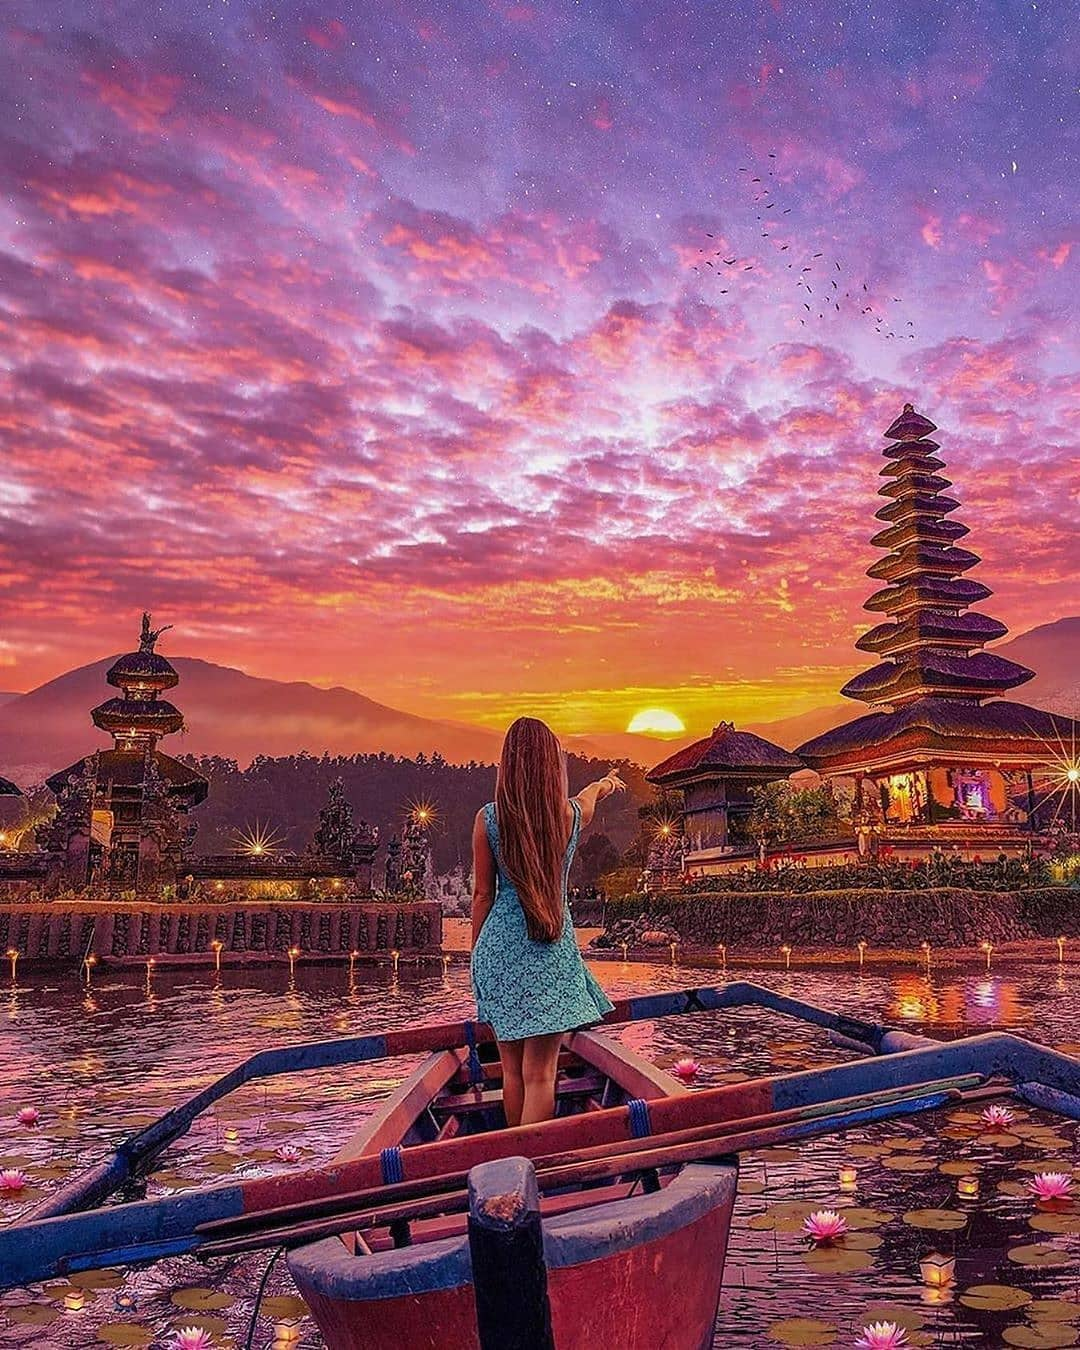 Bali: Harga Tiket Travel Surabaya Bali